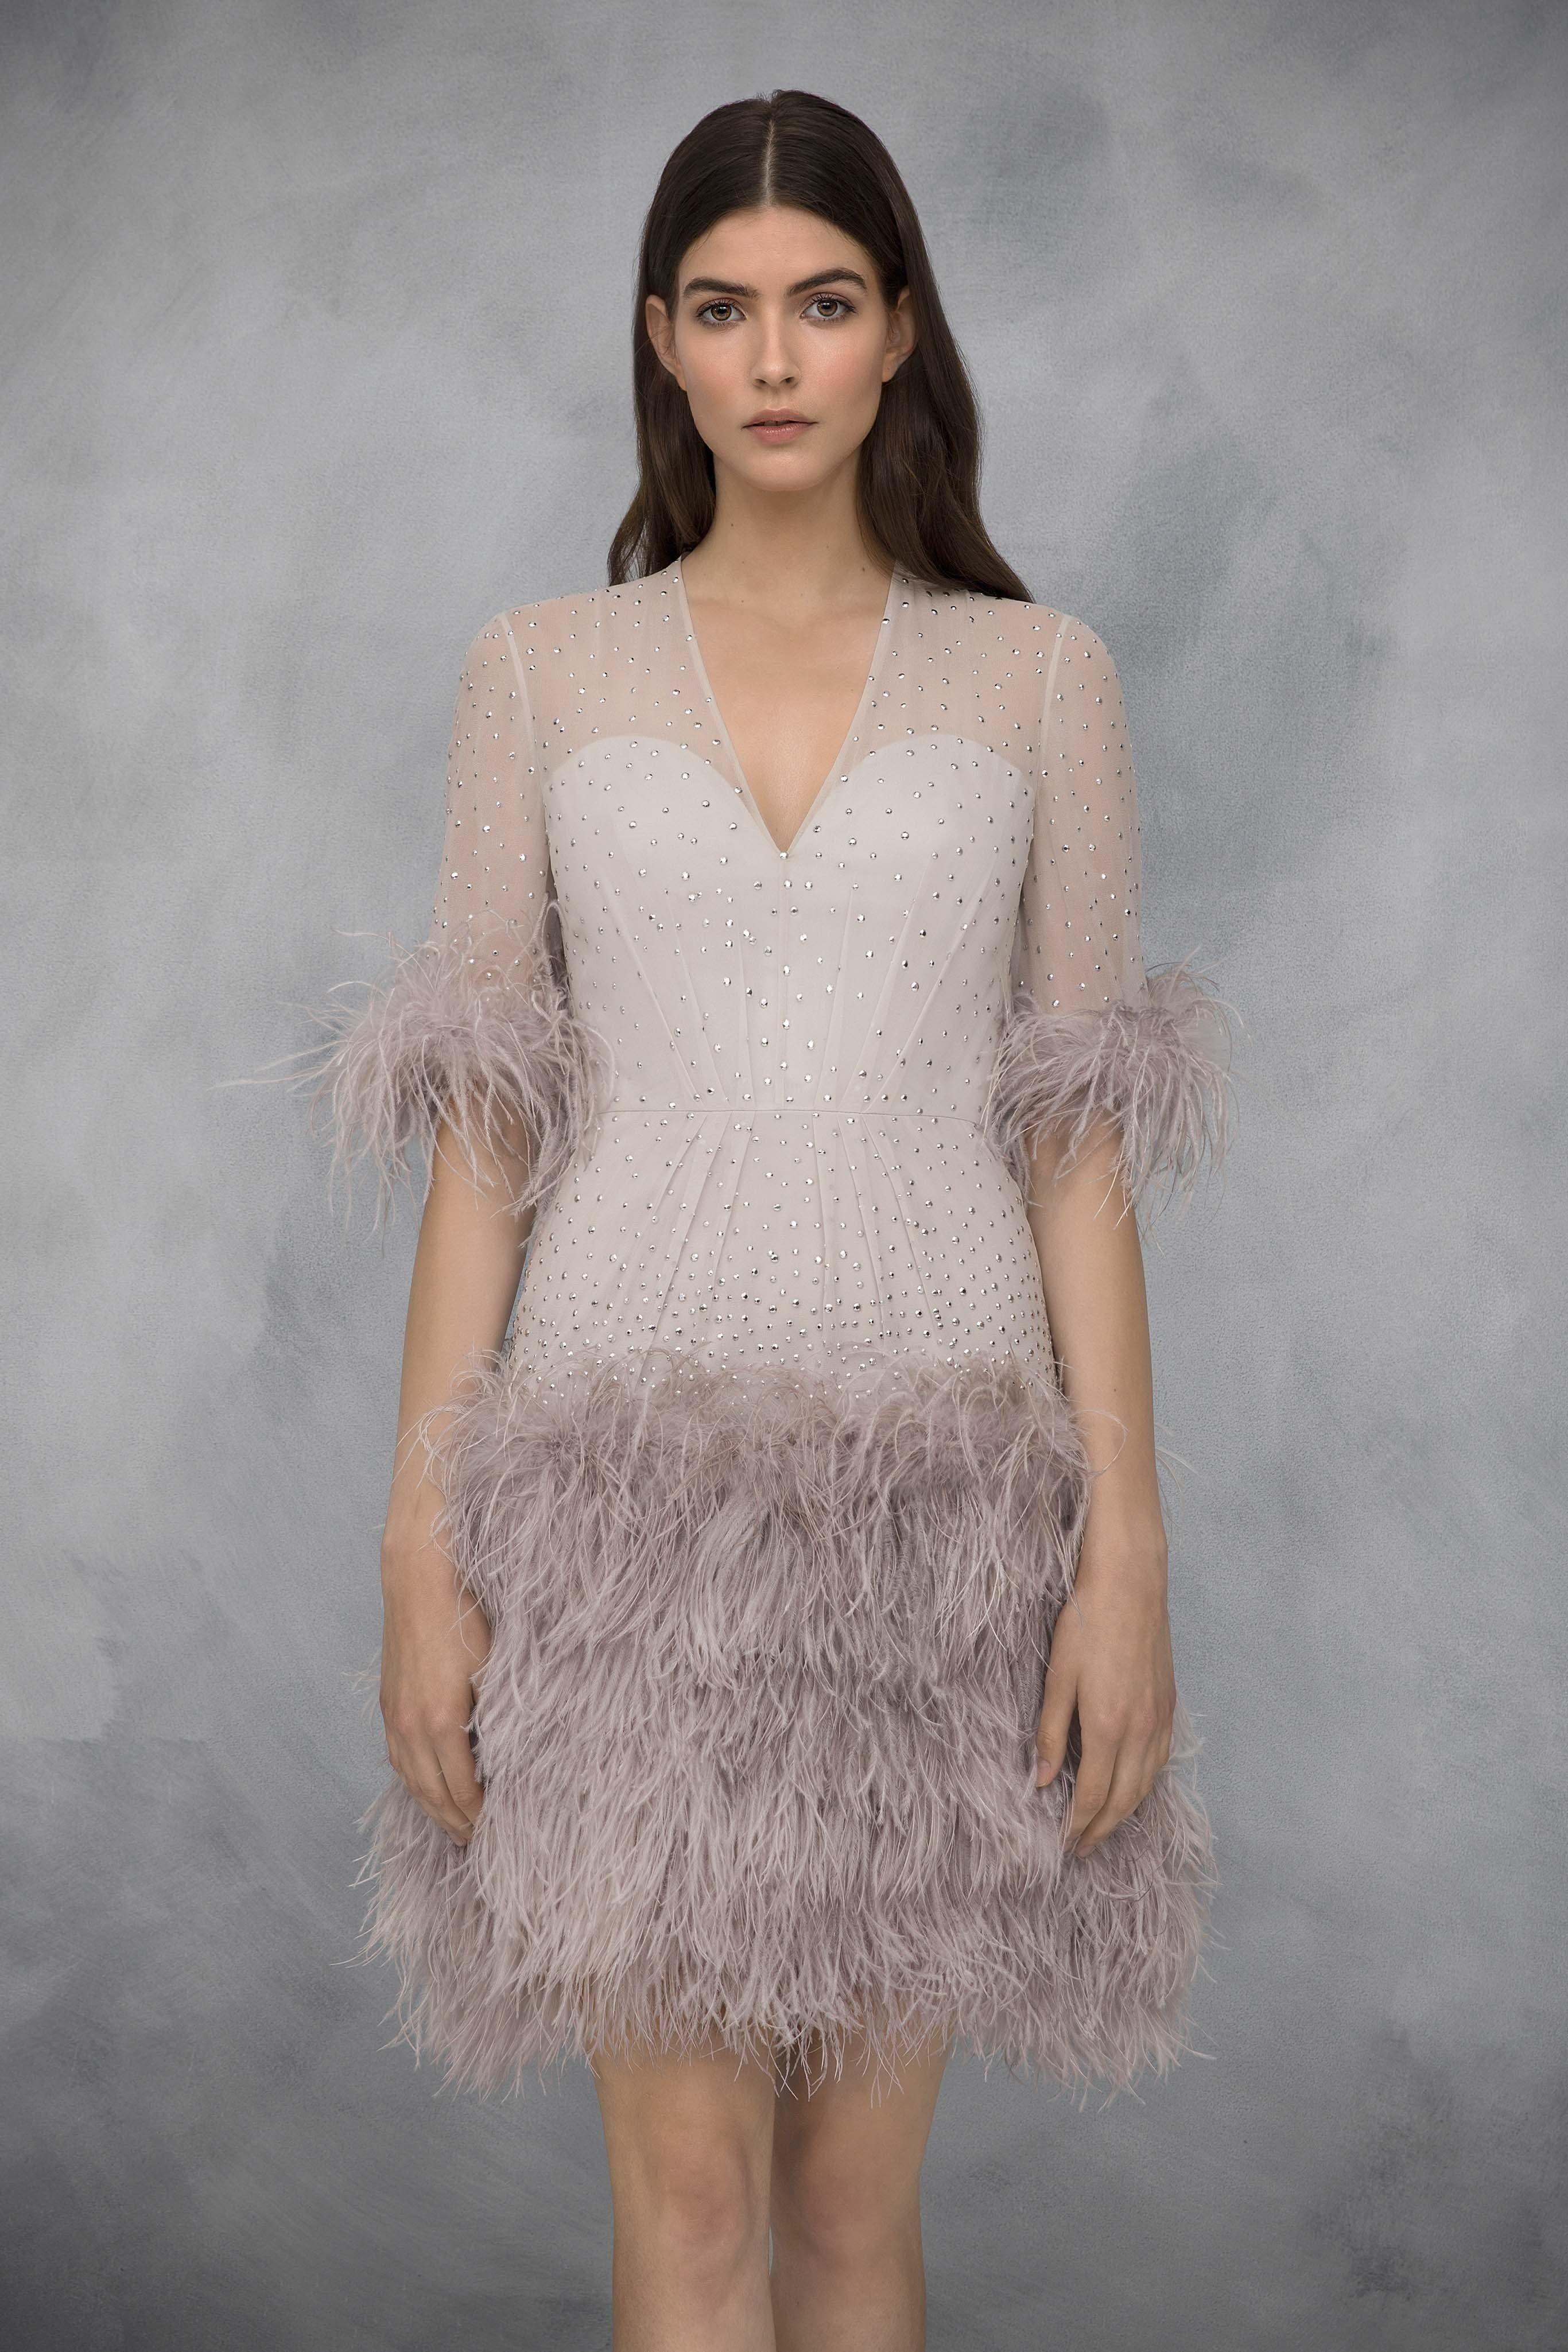 f987b3901b Jenny Packham Resort 2019 London Collection - Vogue purveyoroffinefabrics   rexfabrics  passionforfabrics